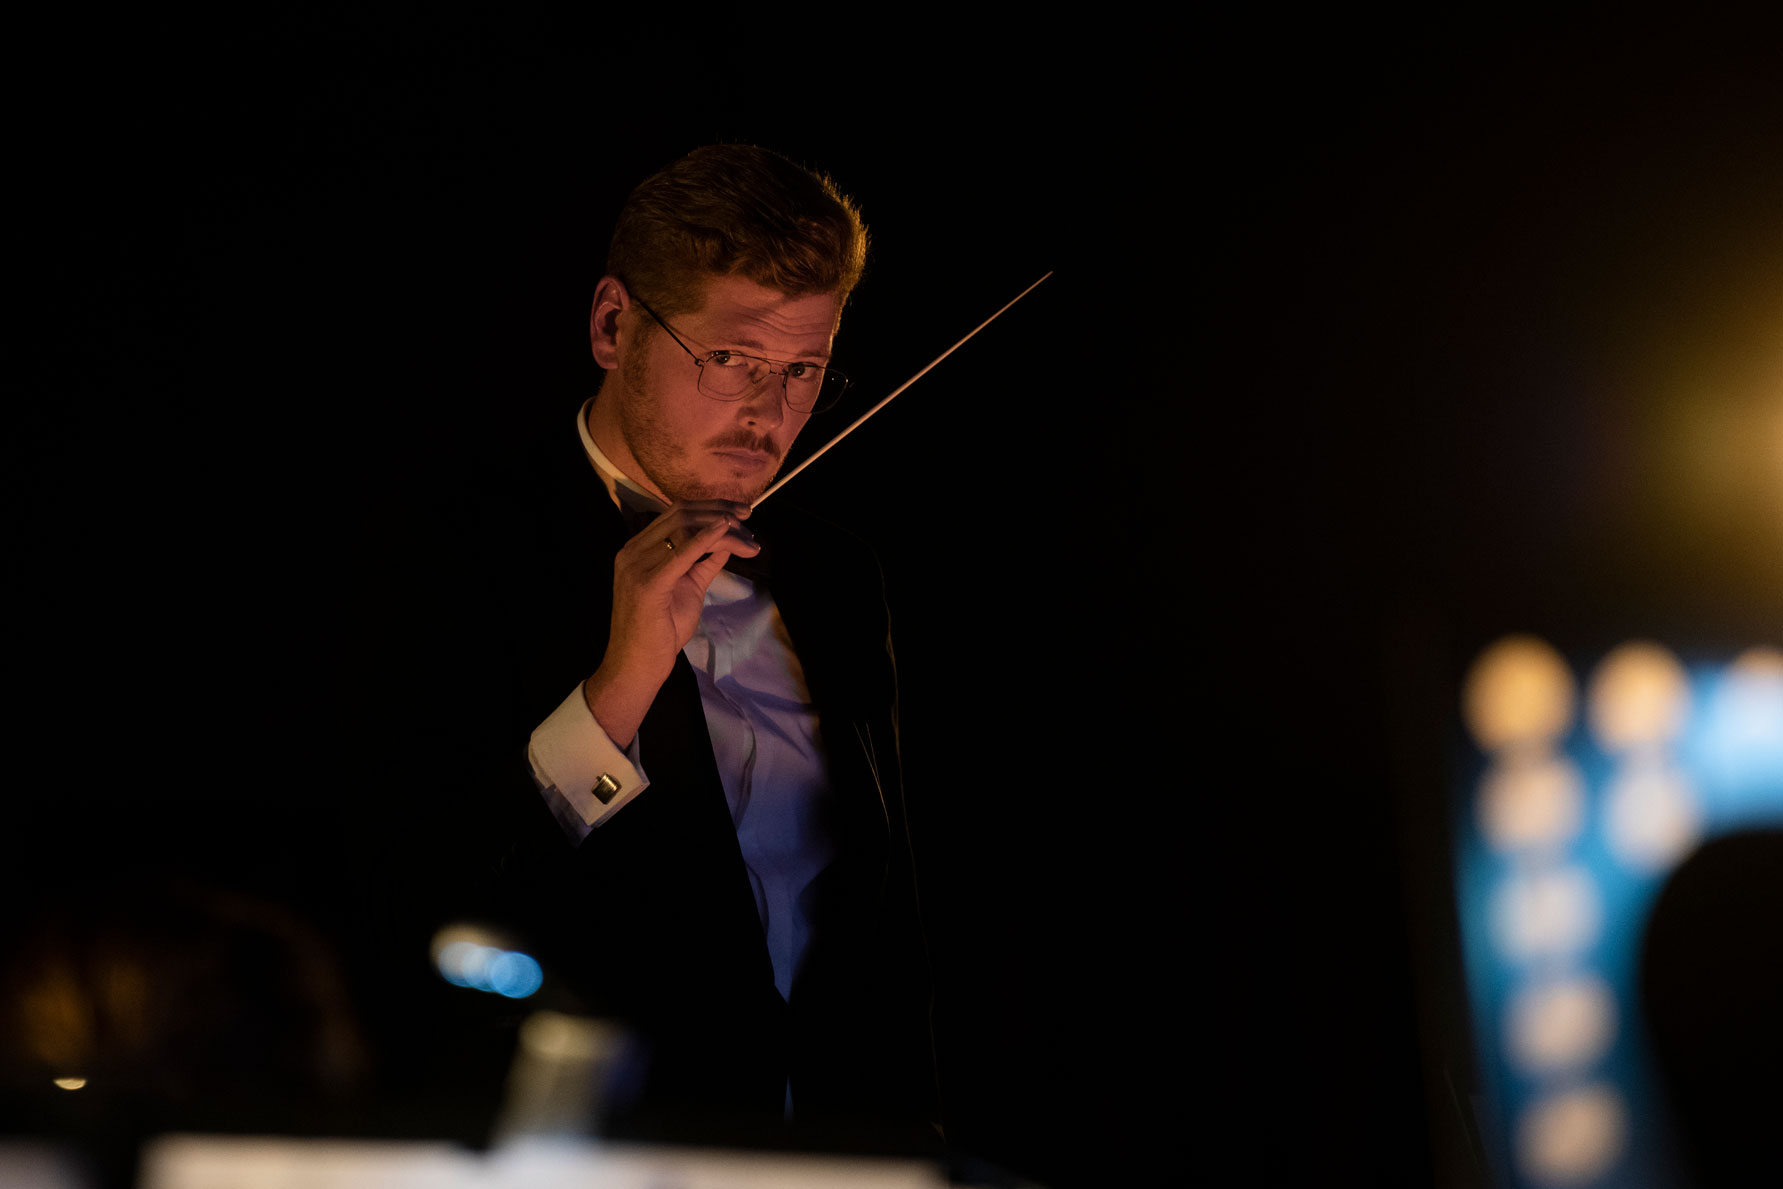 Jurgen Wentzel, dirigent stedelijk orkest borne